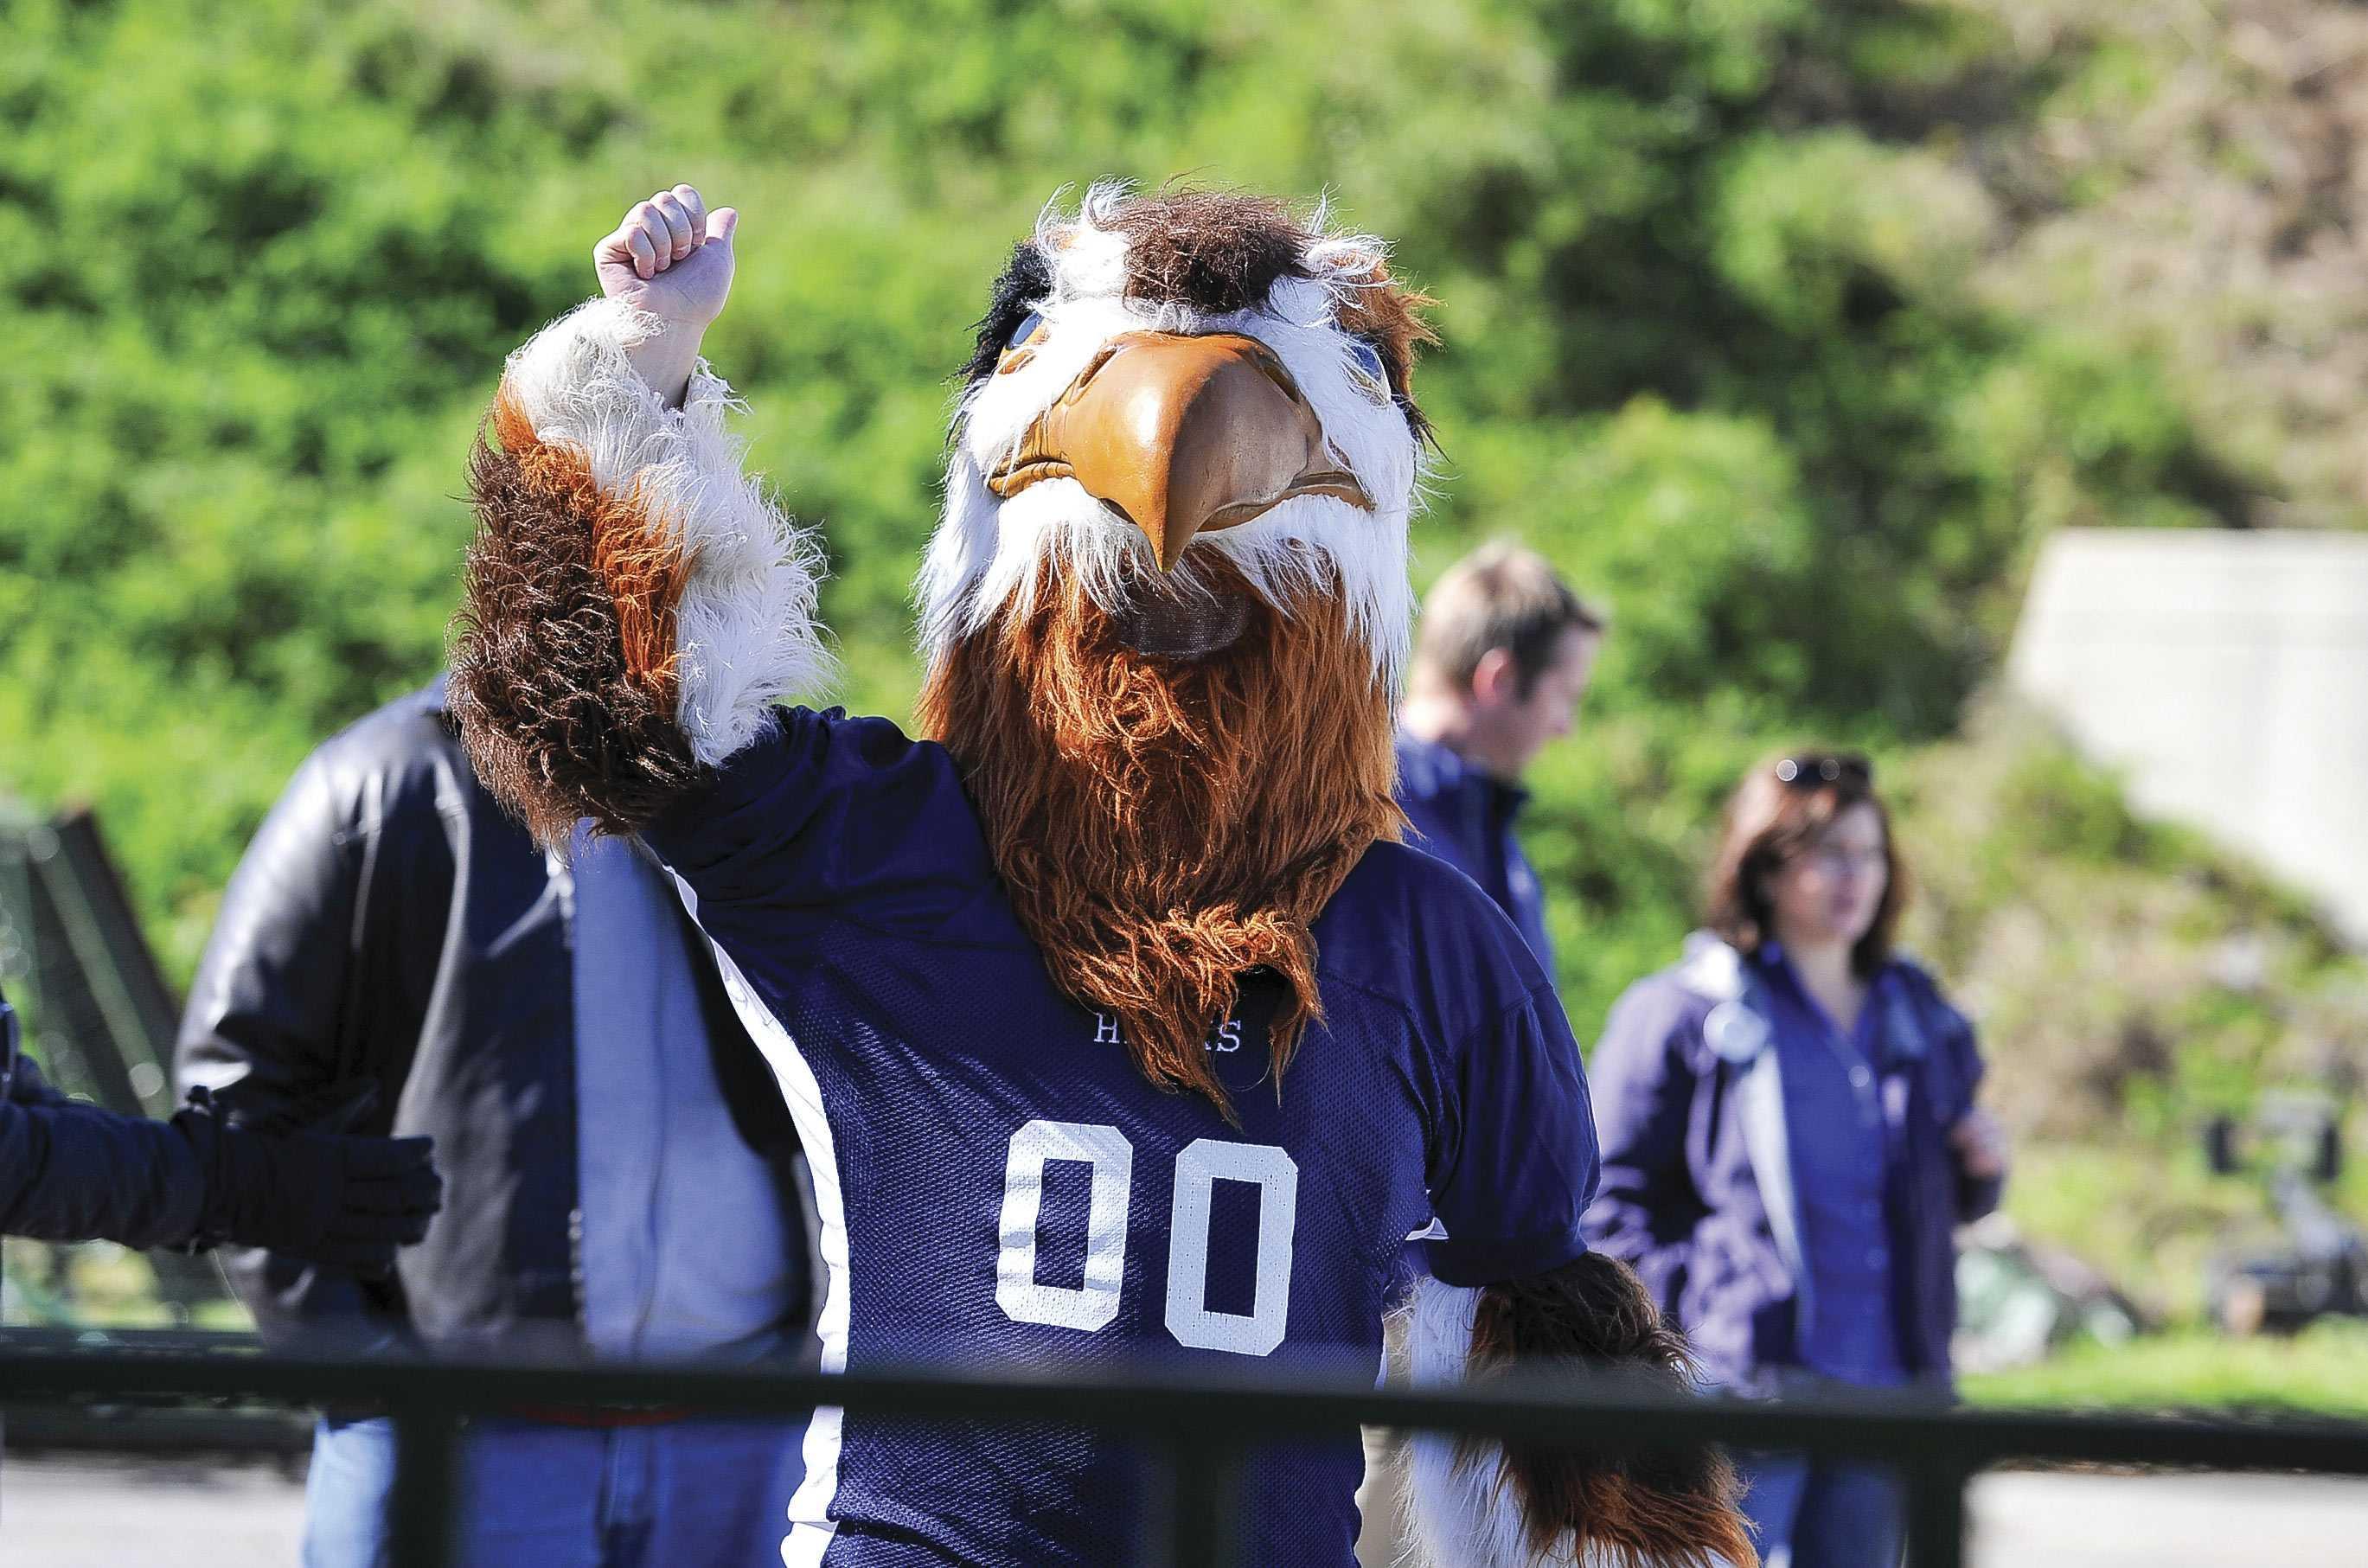 The Saint Anselm Hawk mascot.